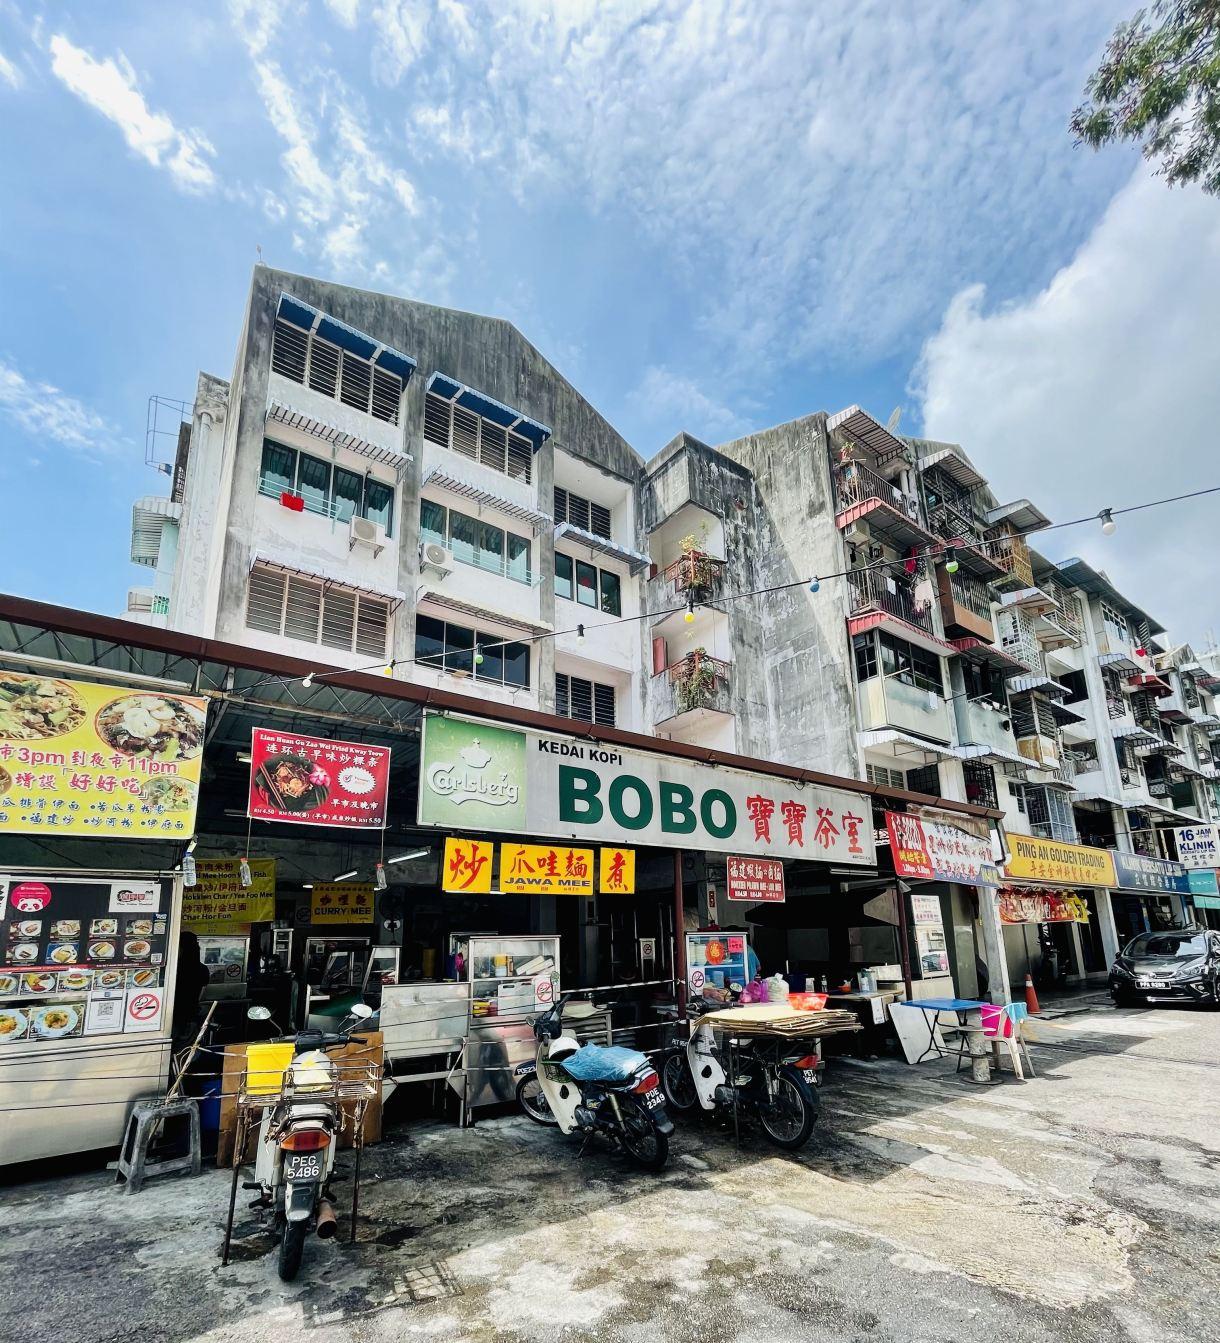 Kedai Kopi Bobo Penang